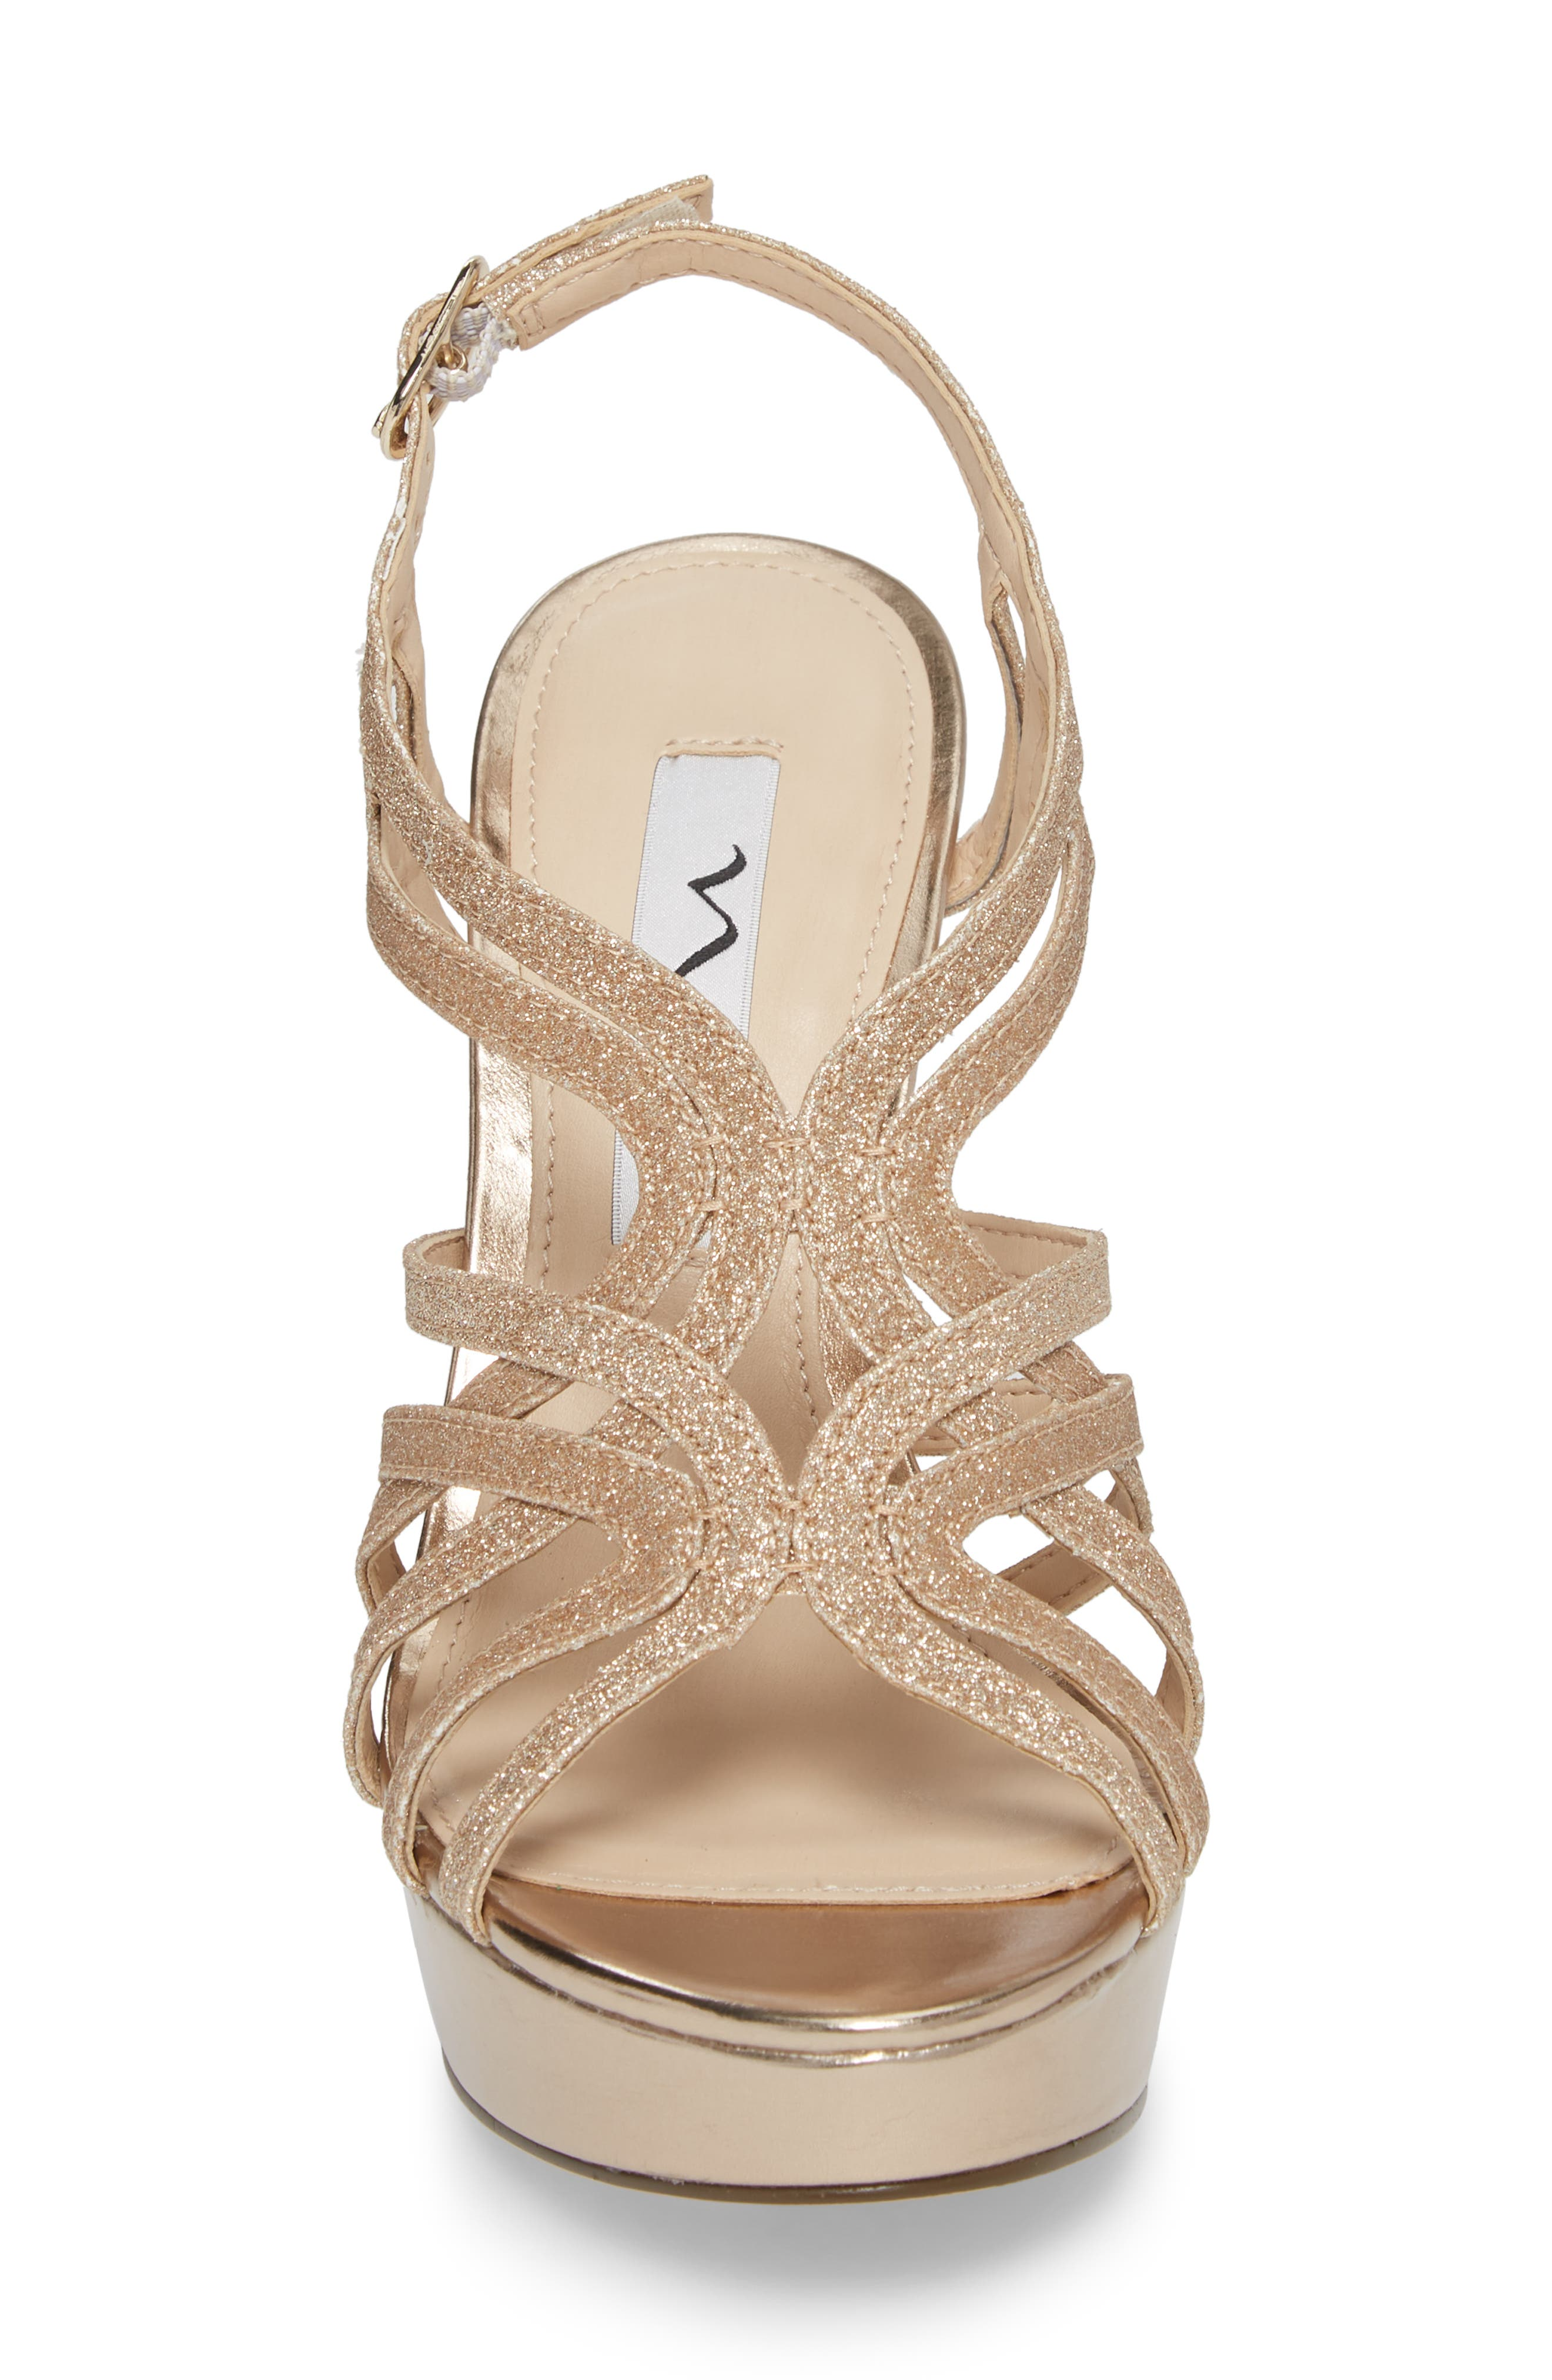 Solina Platform Sandal,                             Alternate thumbnail 4, color,                             Gold Glitter Fabric